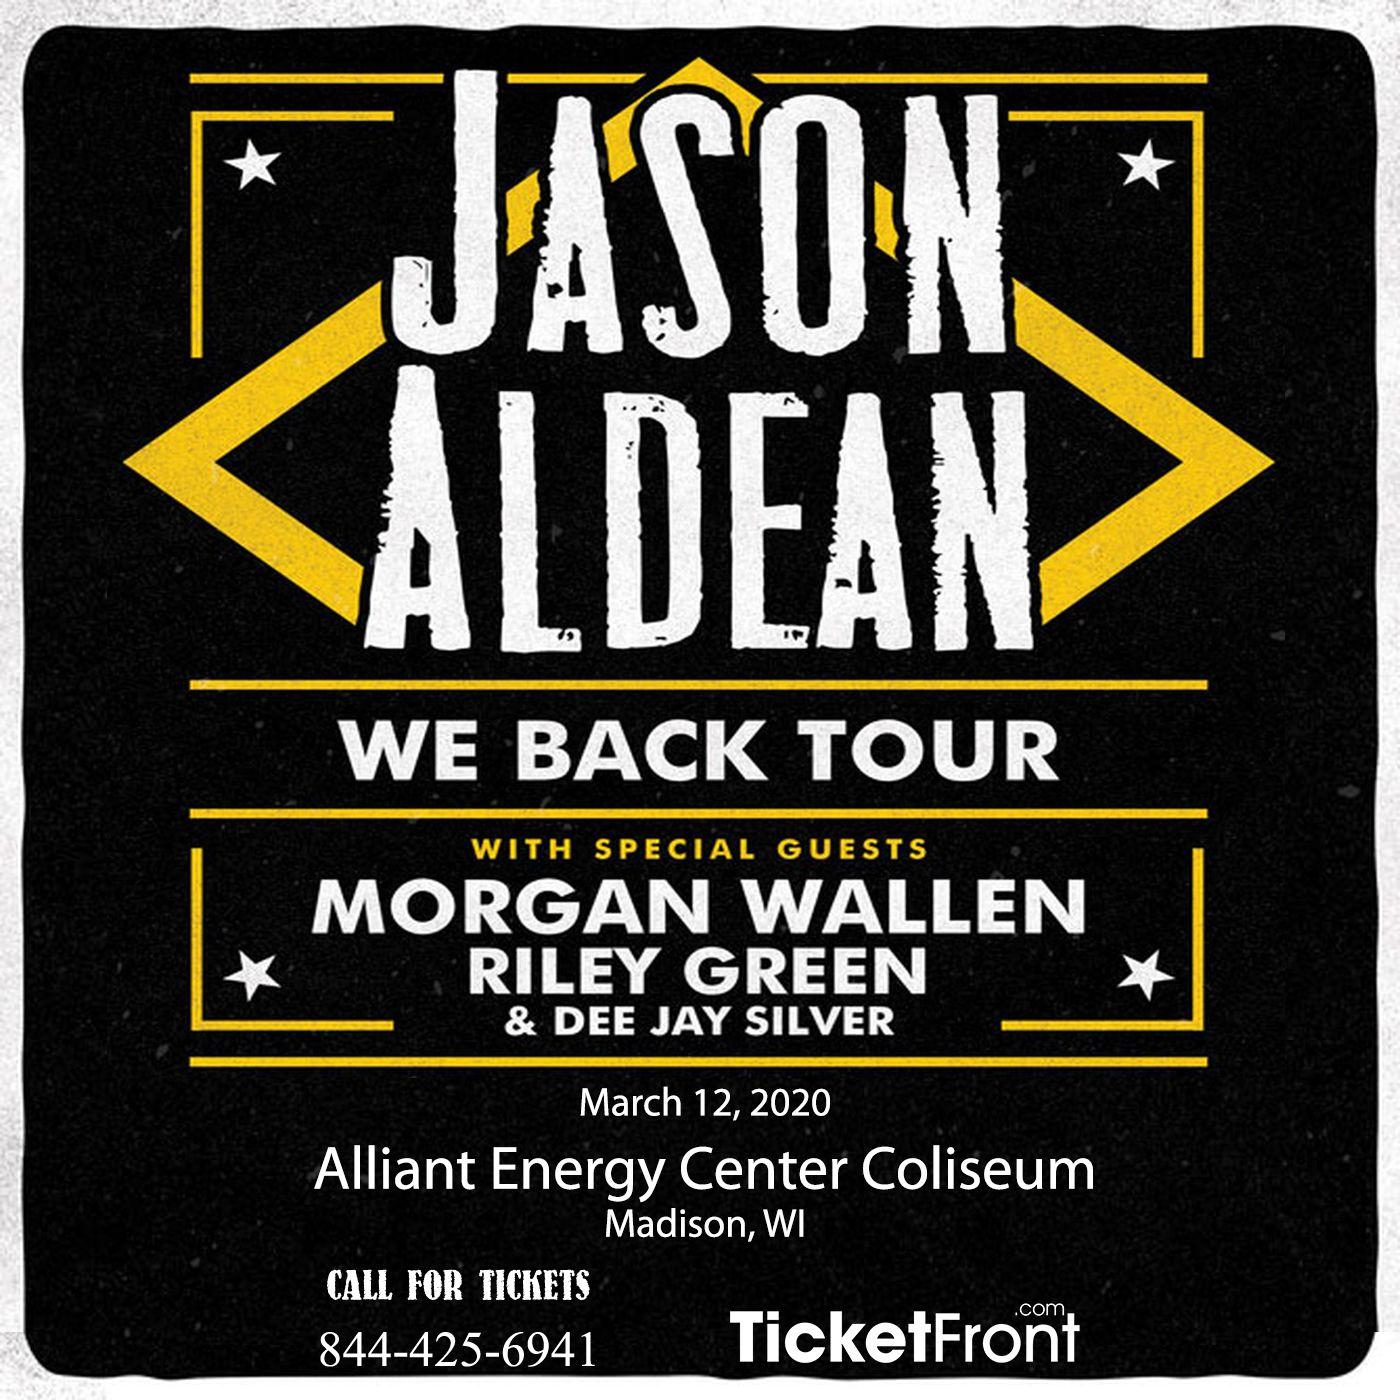 Jason Aldean Morgan Wallen Riley Green At Alliant Energy Center Coliseum Jason Aldean Jason Aldean Tickets Jason